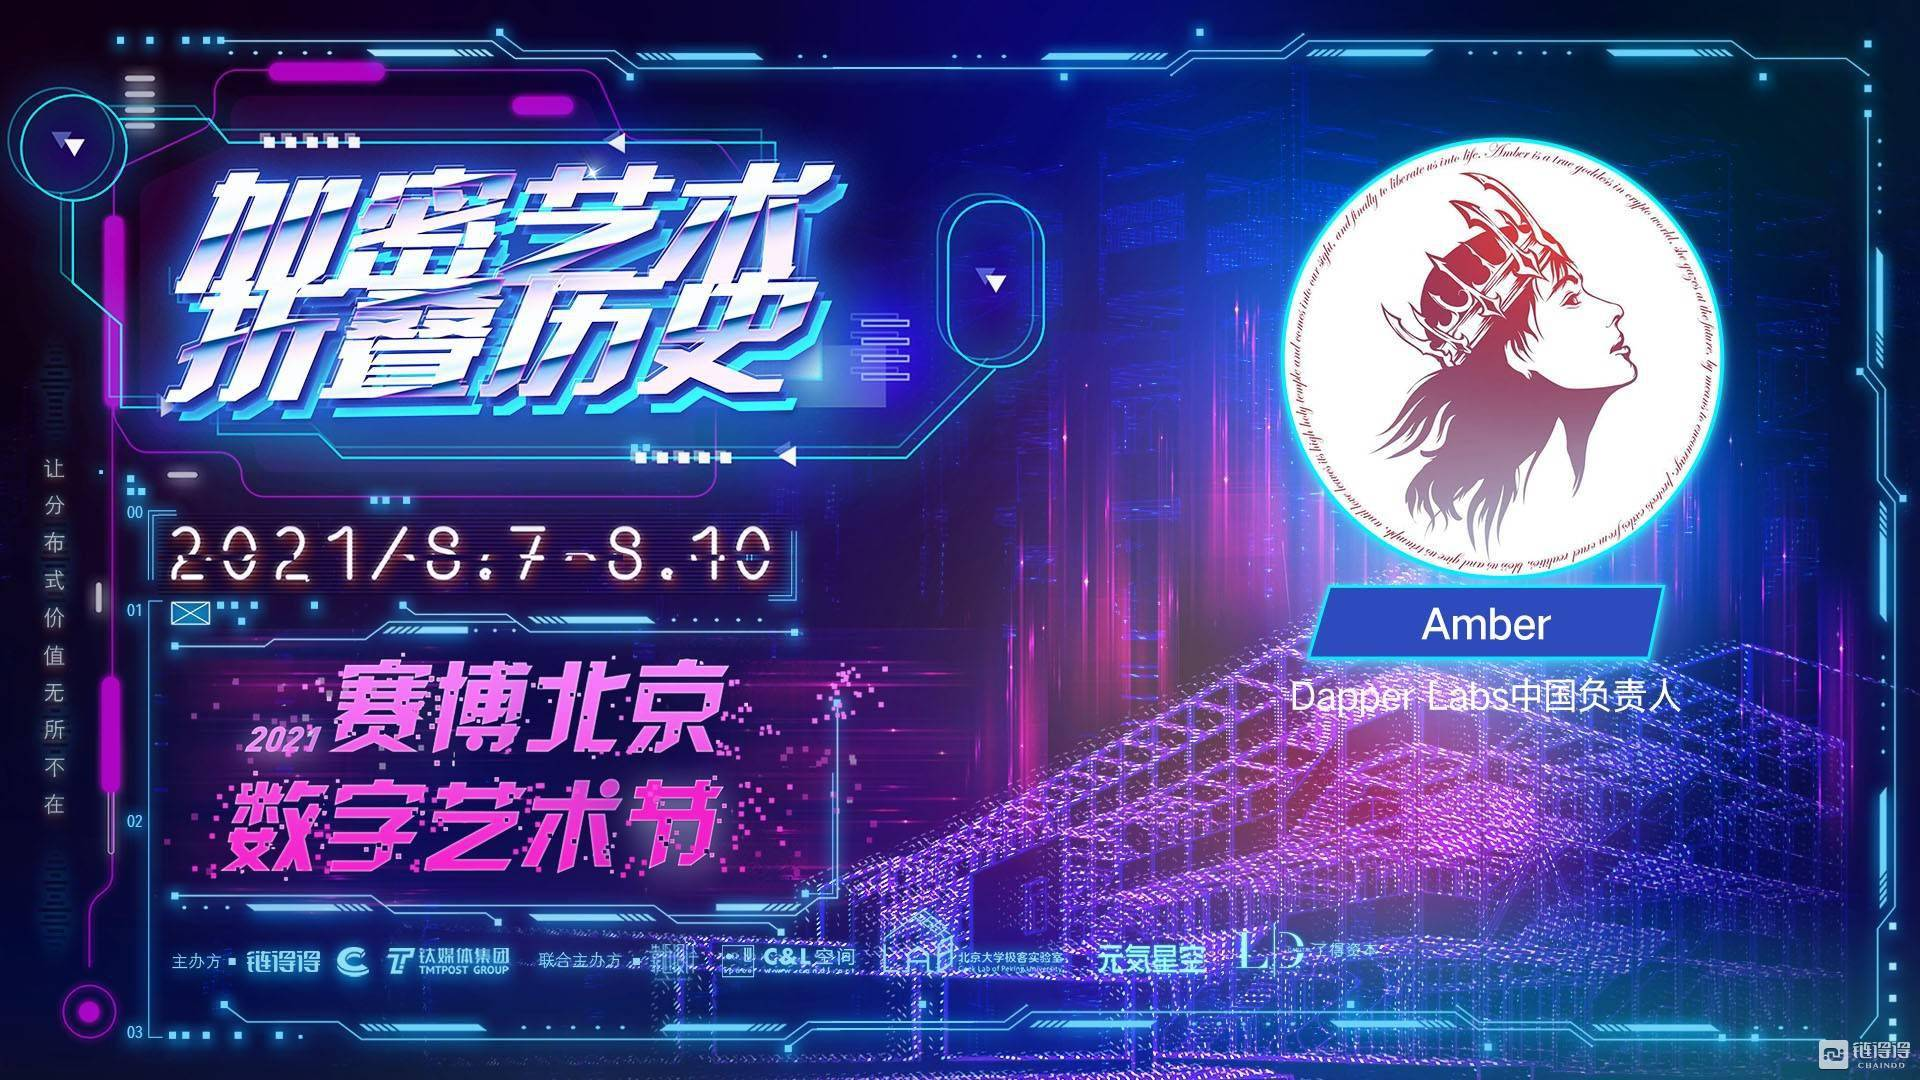 Dapper Labs 中国负责人Amber:NFT是元宇宙中不可或缺的构成要素 | 2021赛博北京·数字艺术节